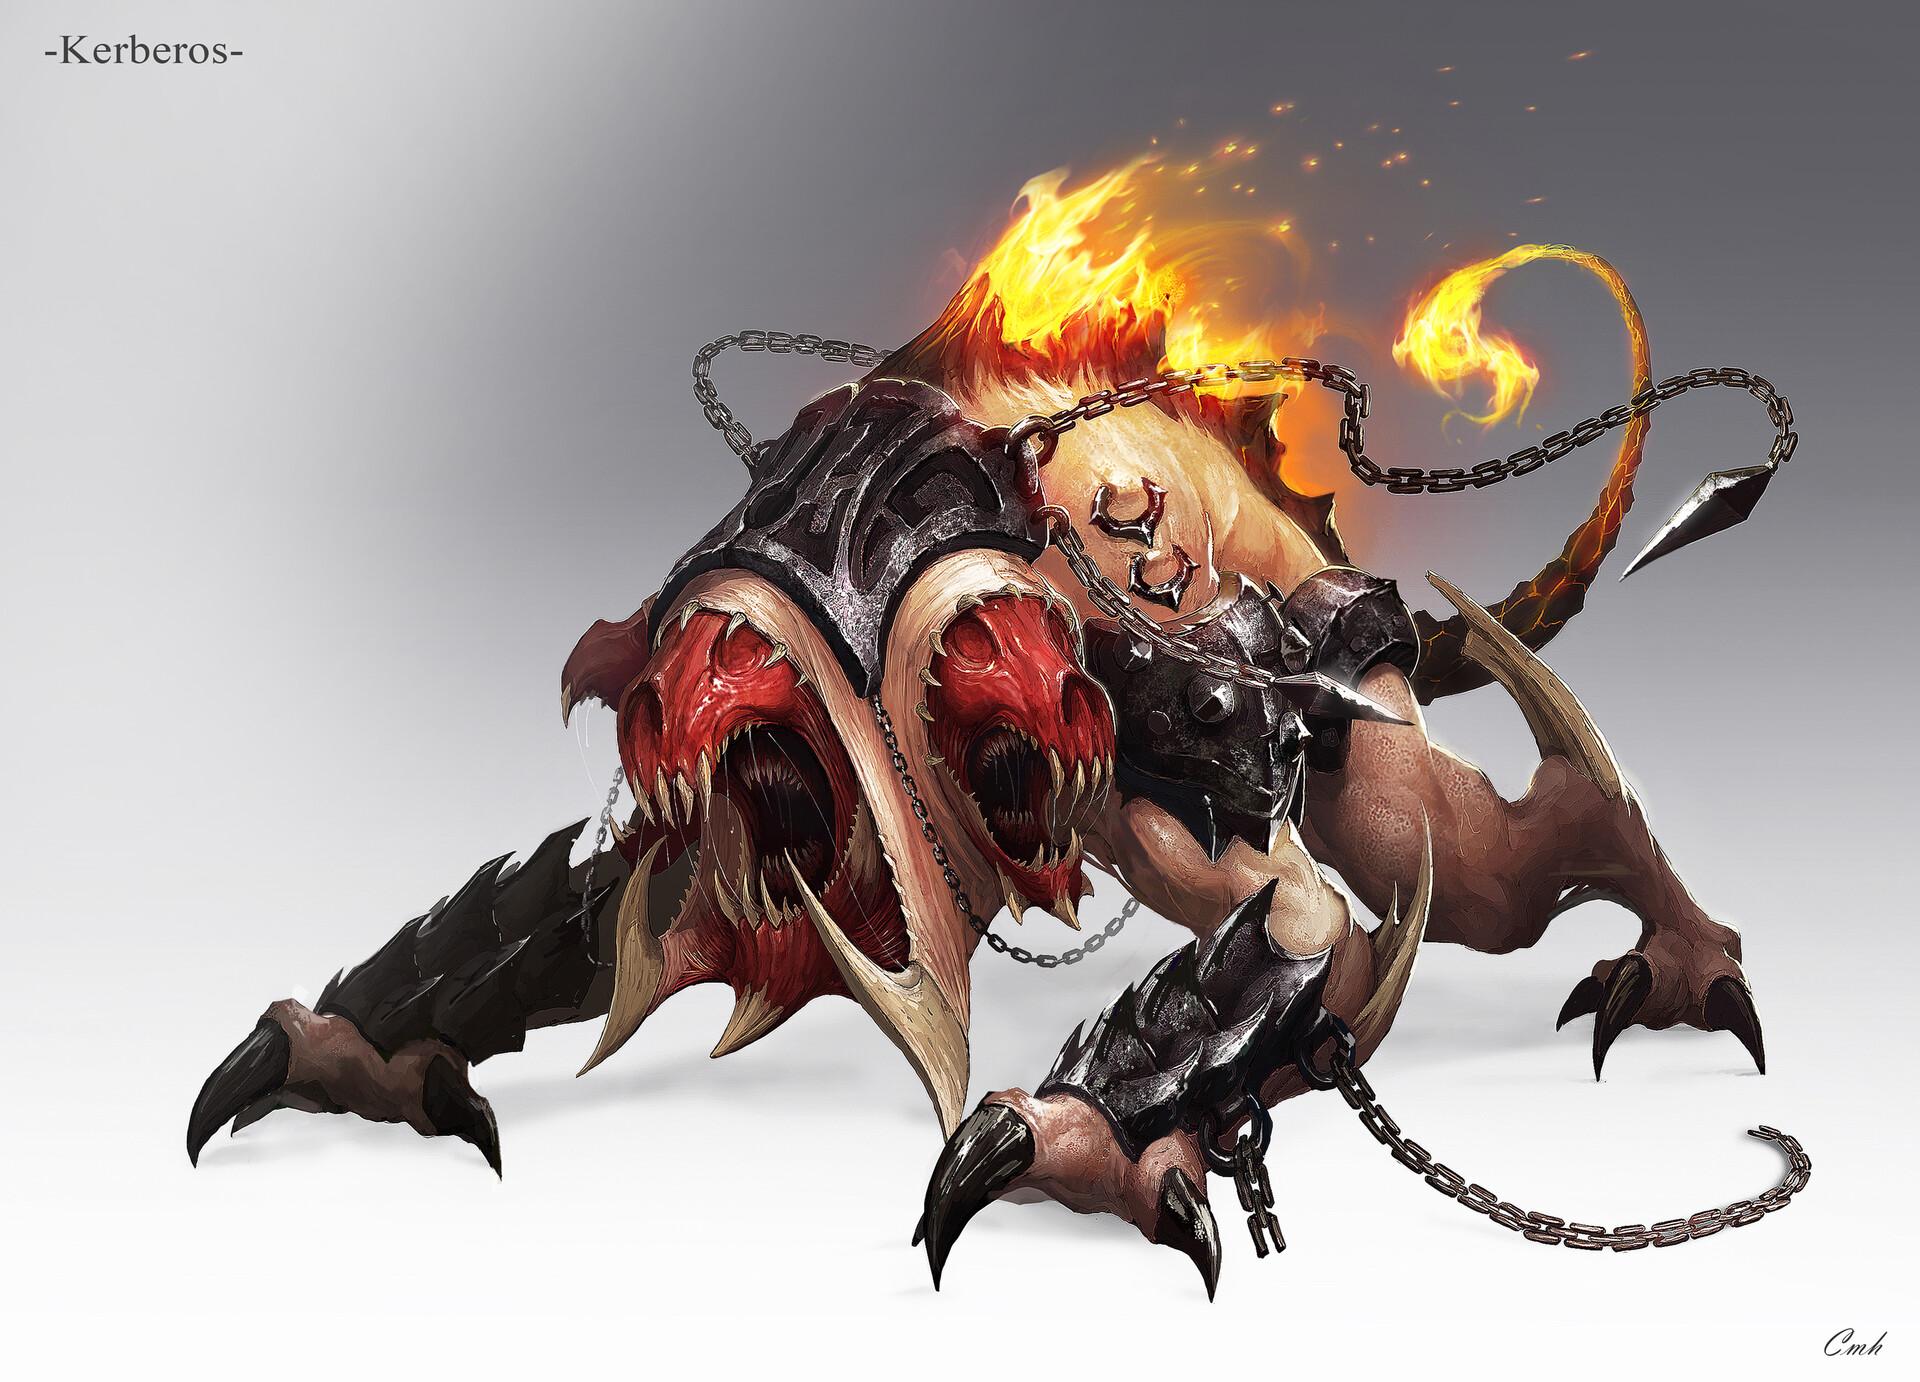 b36a556a ArtStation - Inferno demon creature (火焰地狱 怪兽), P.E.K.K.A 🤖